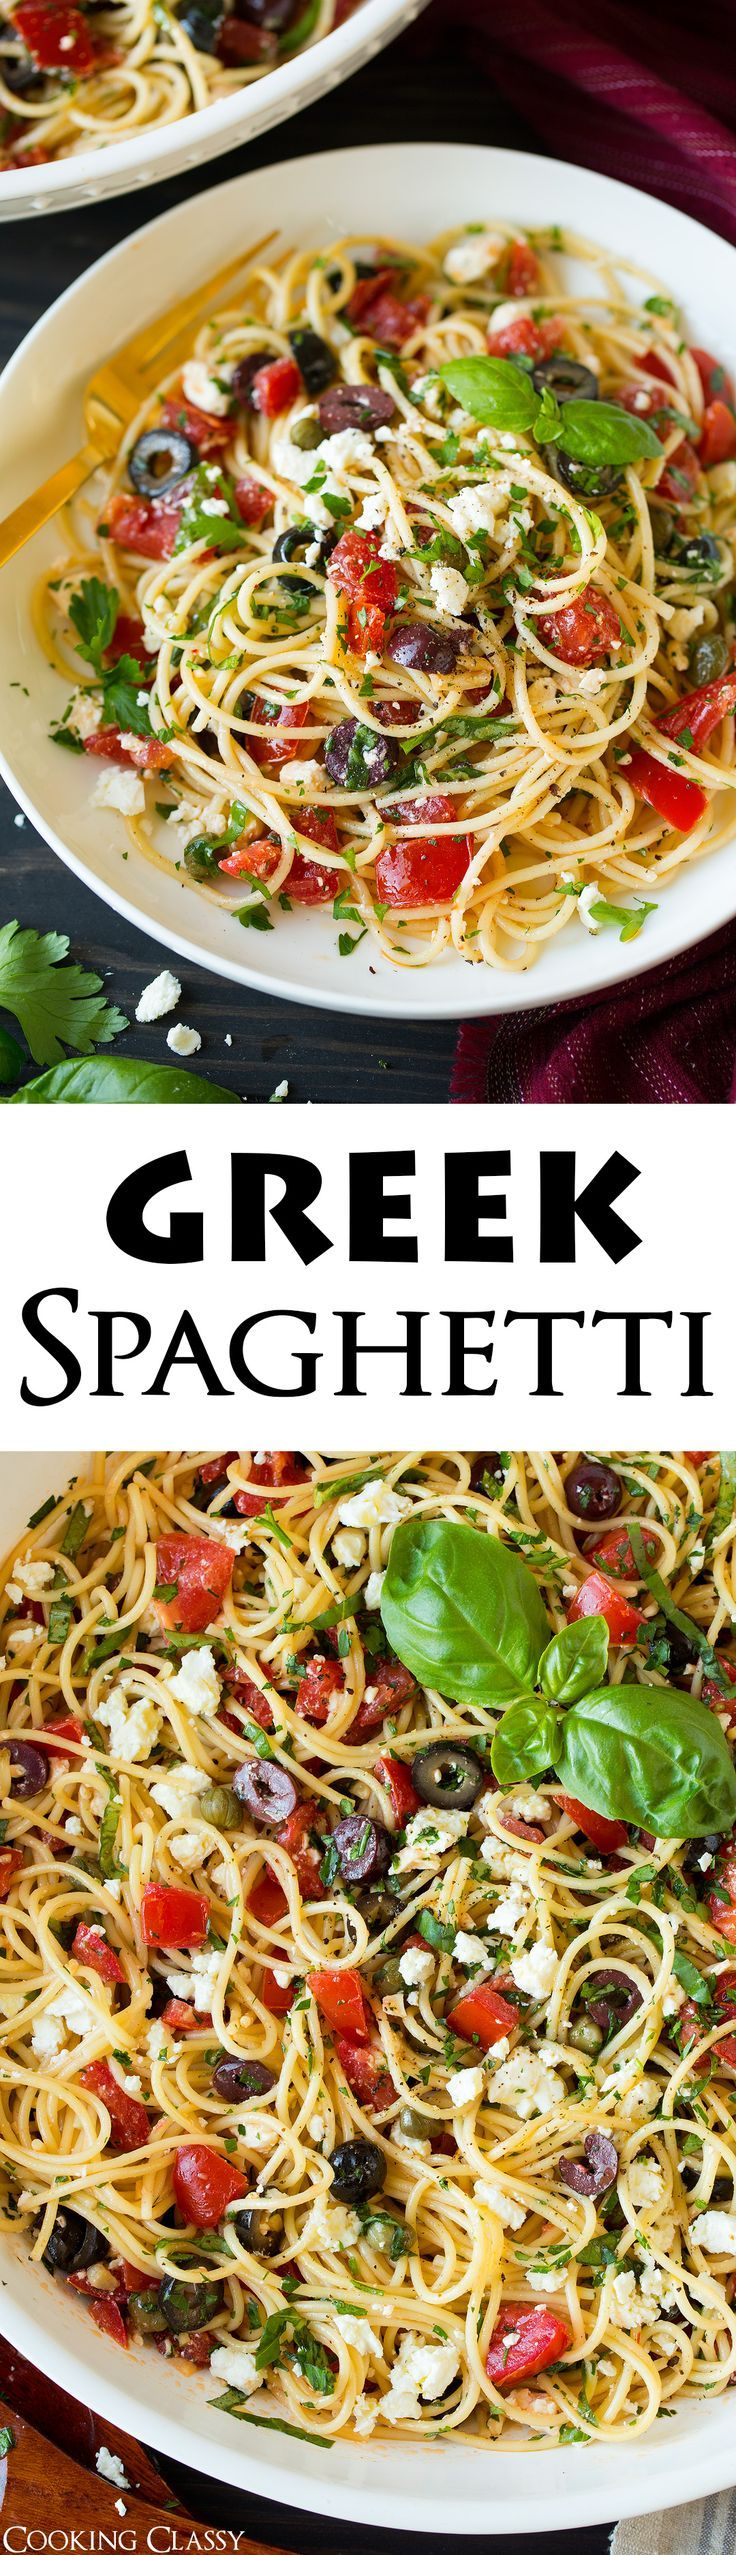 Greek Spaghetti- make with zucchini noodles!